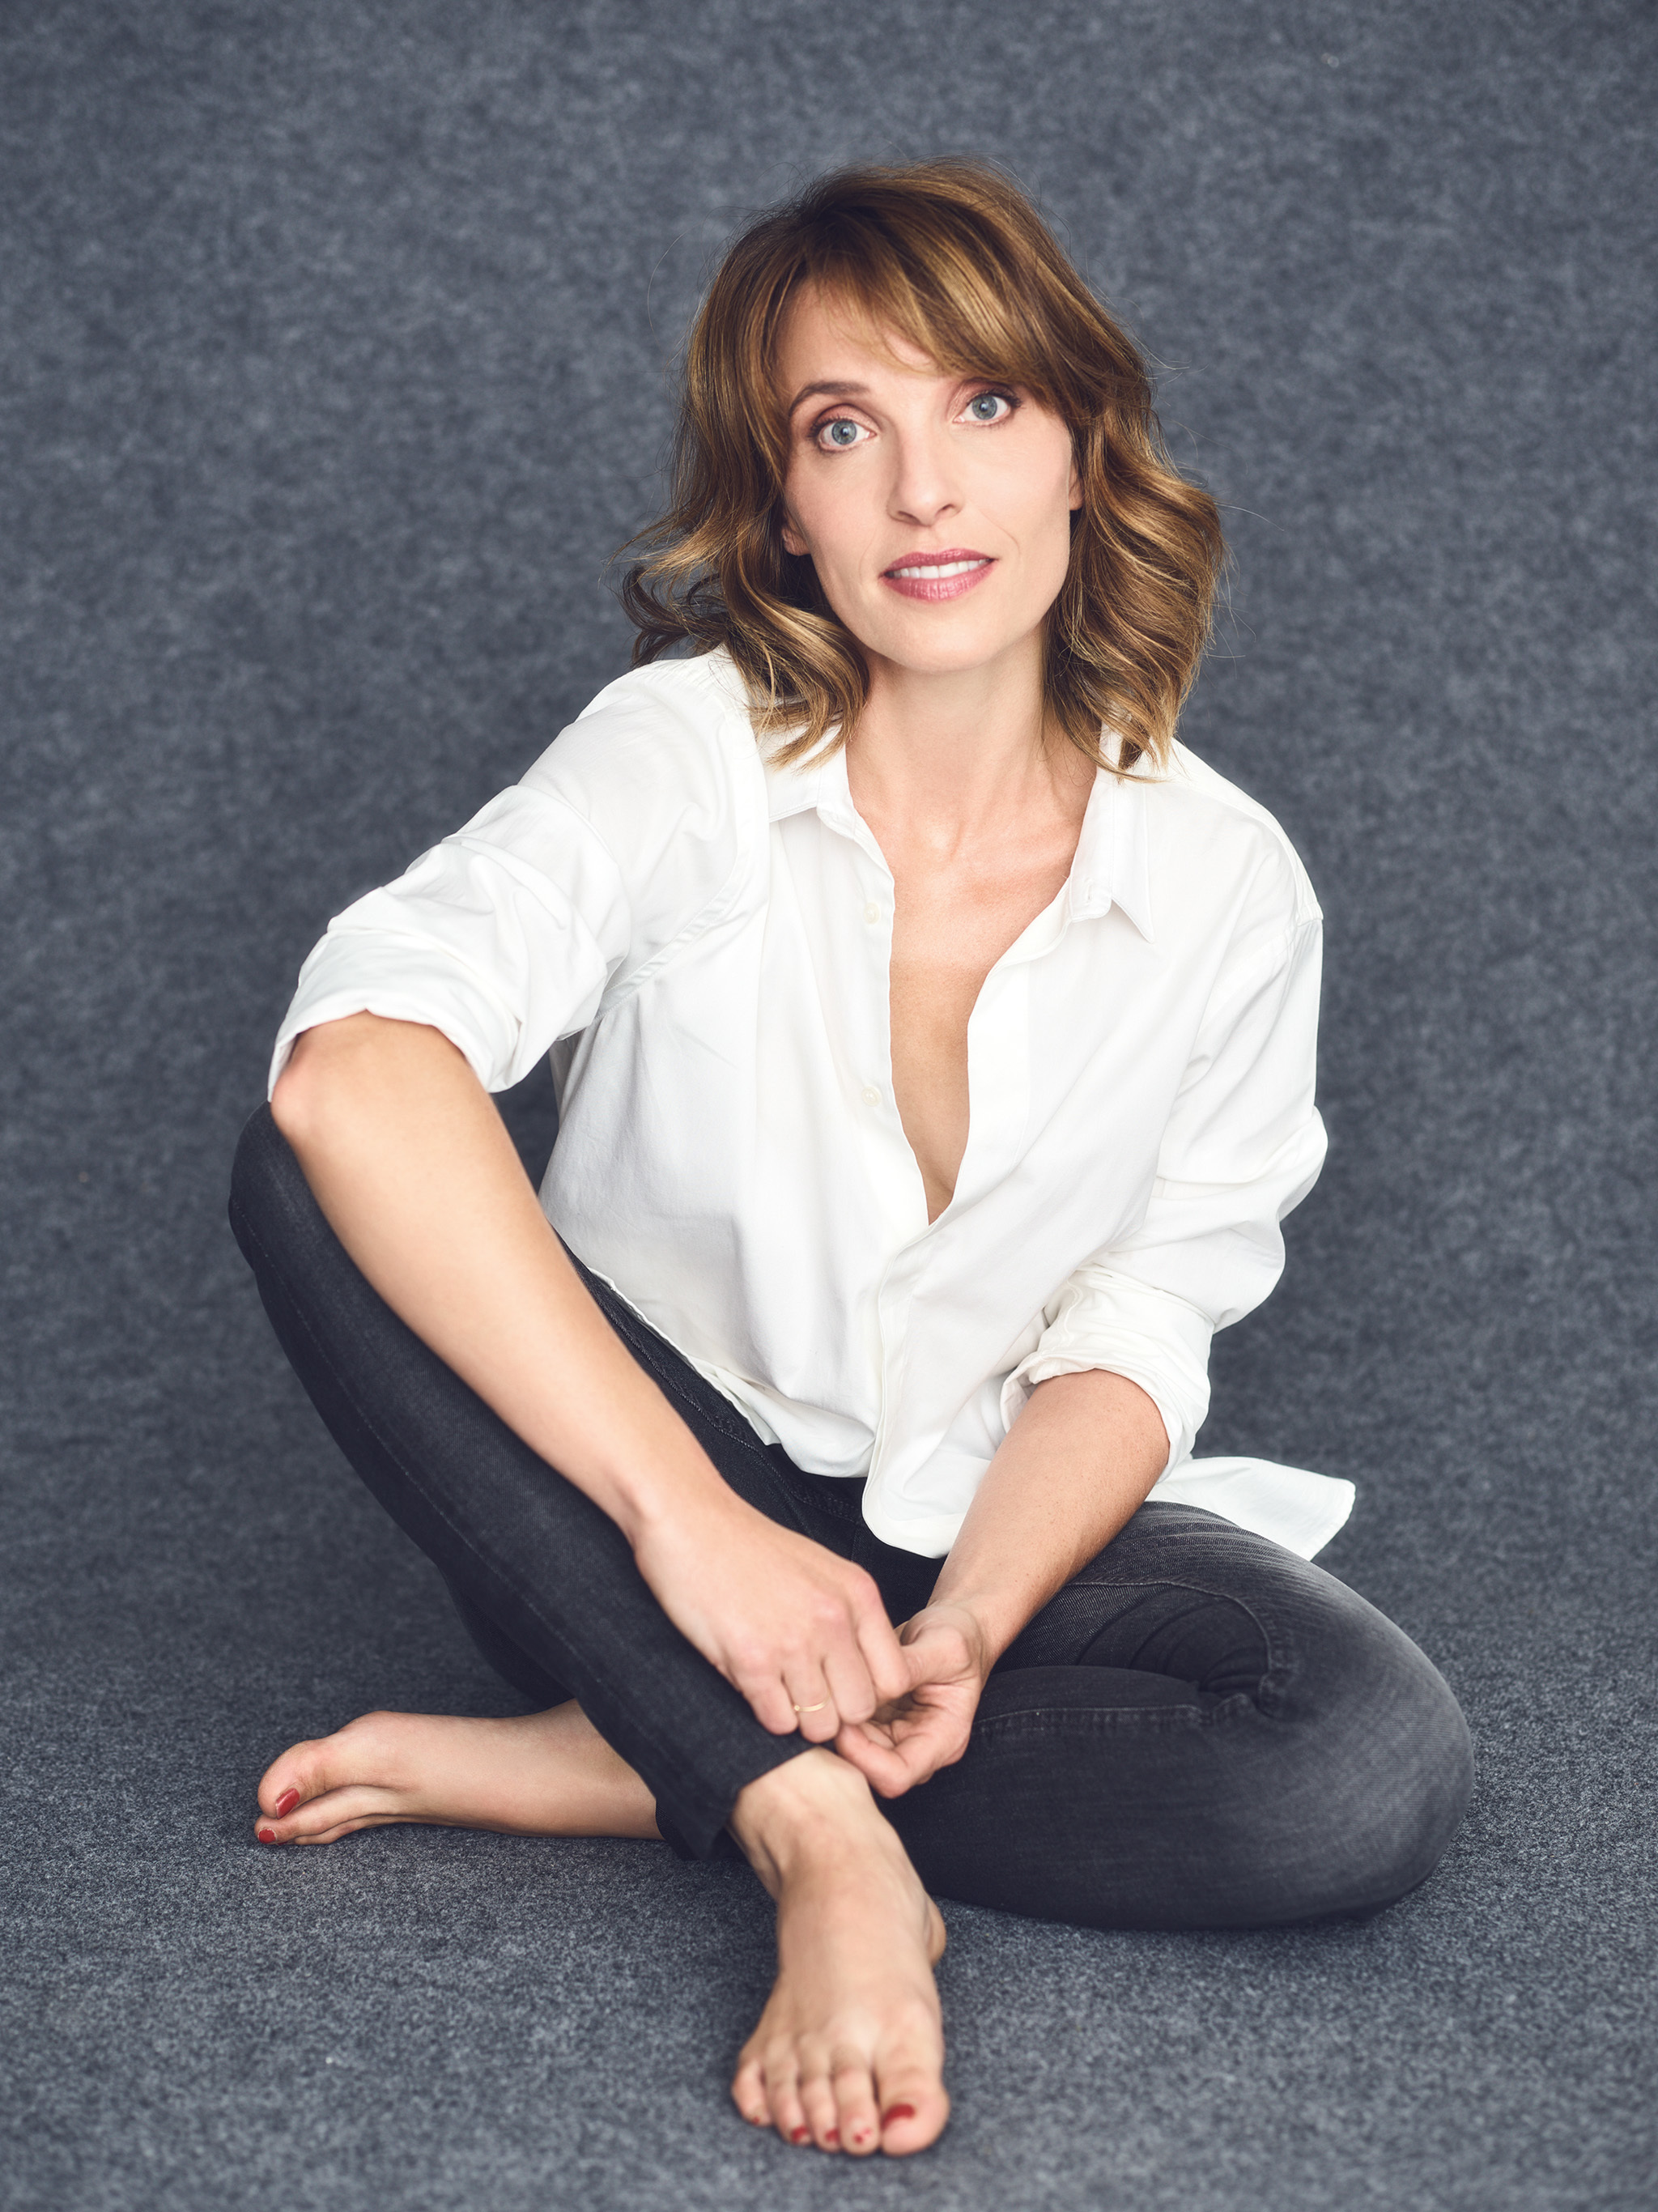 Alix Poisson Nude Photos 35